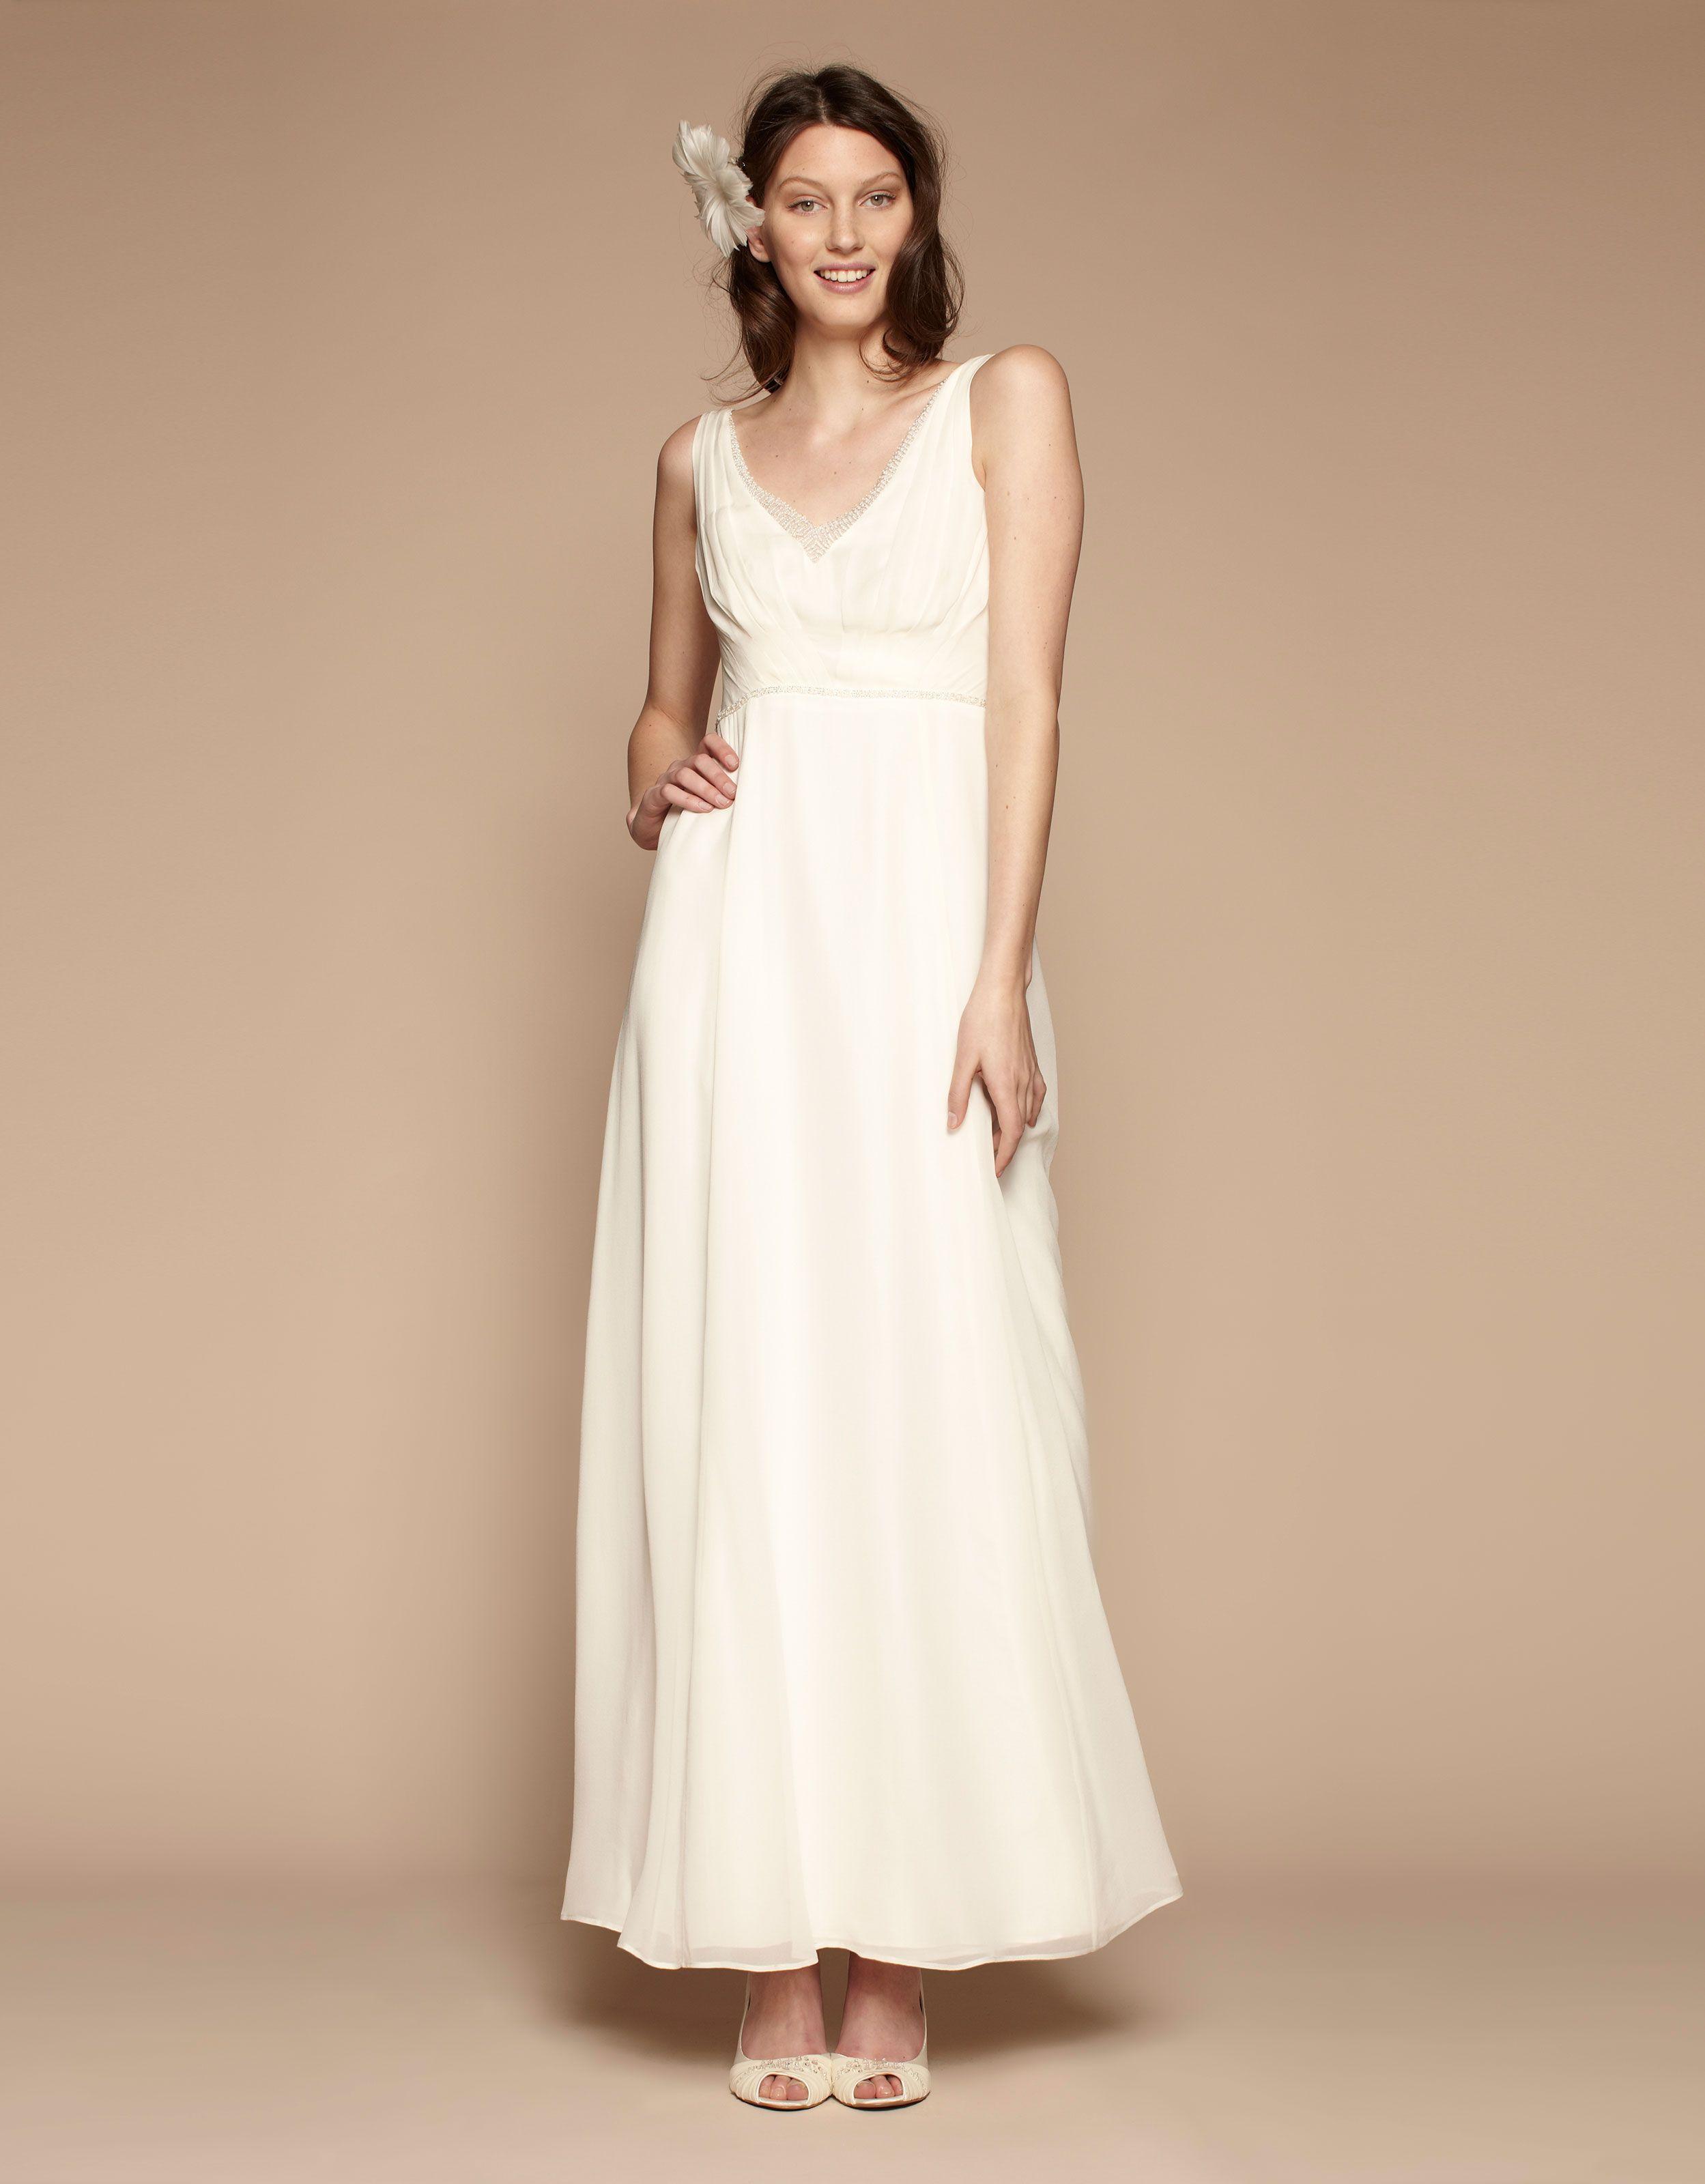 Monsoon wedding dresses   wed   Pinterest   Monsoon, Bridal dresses ...